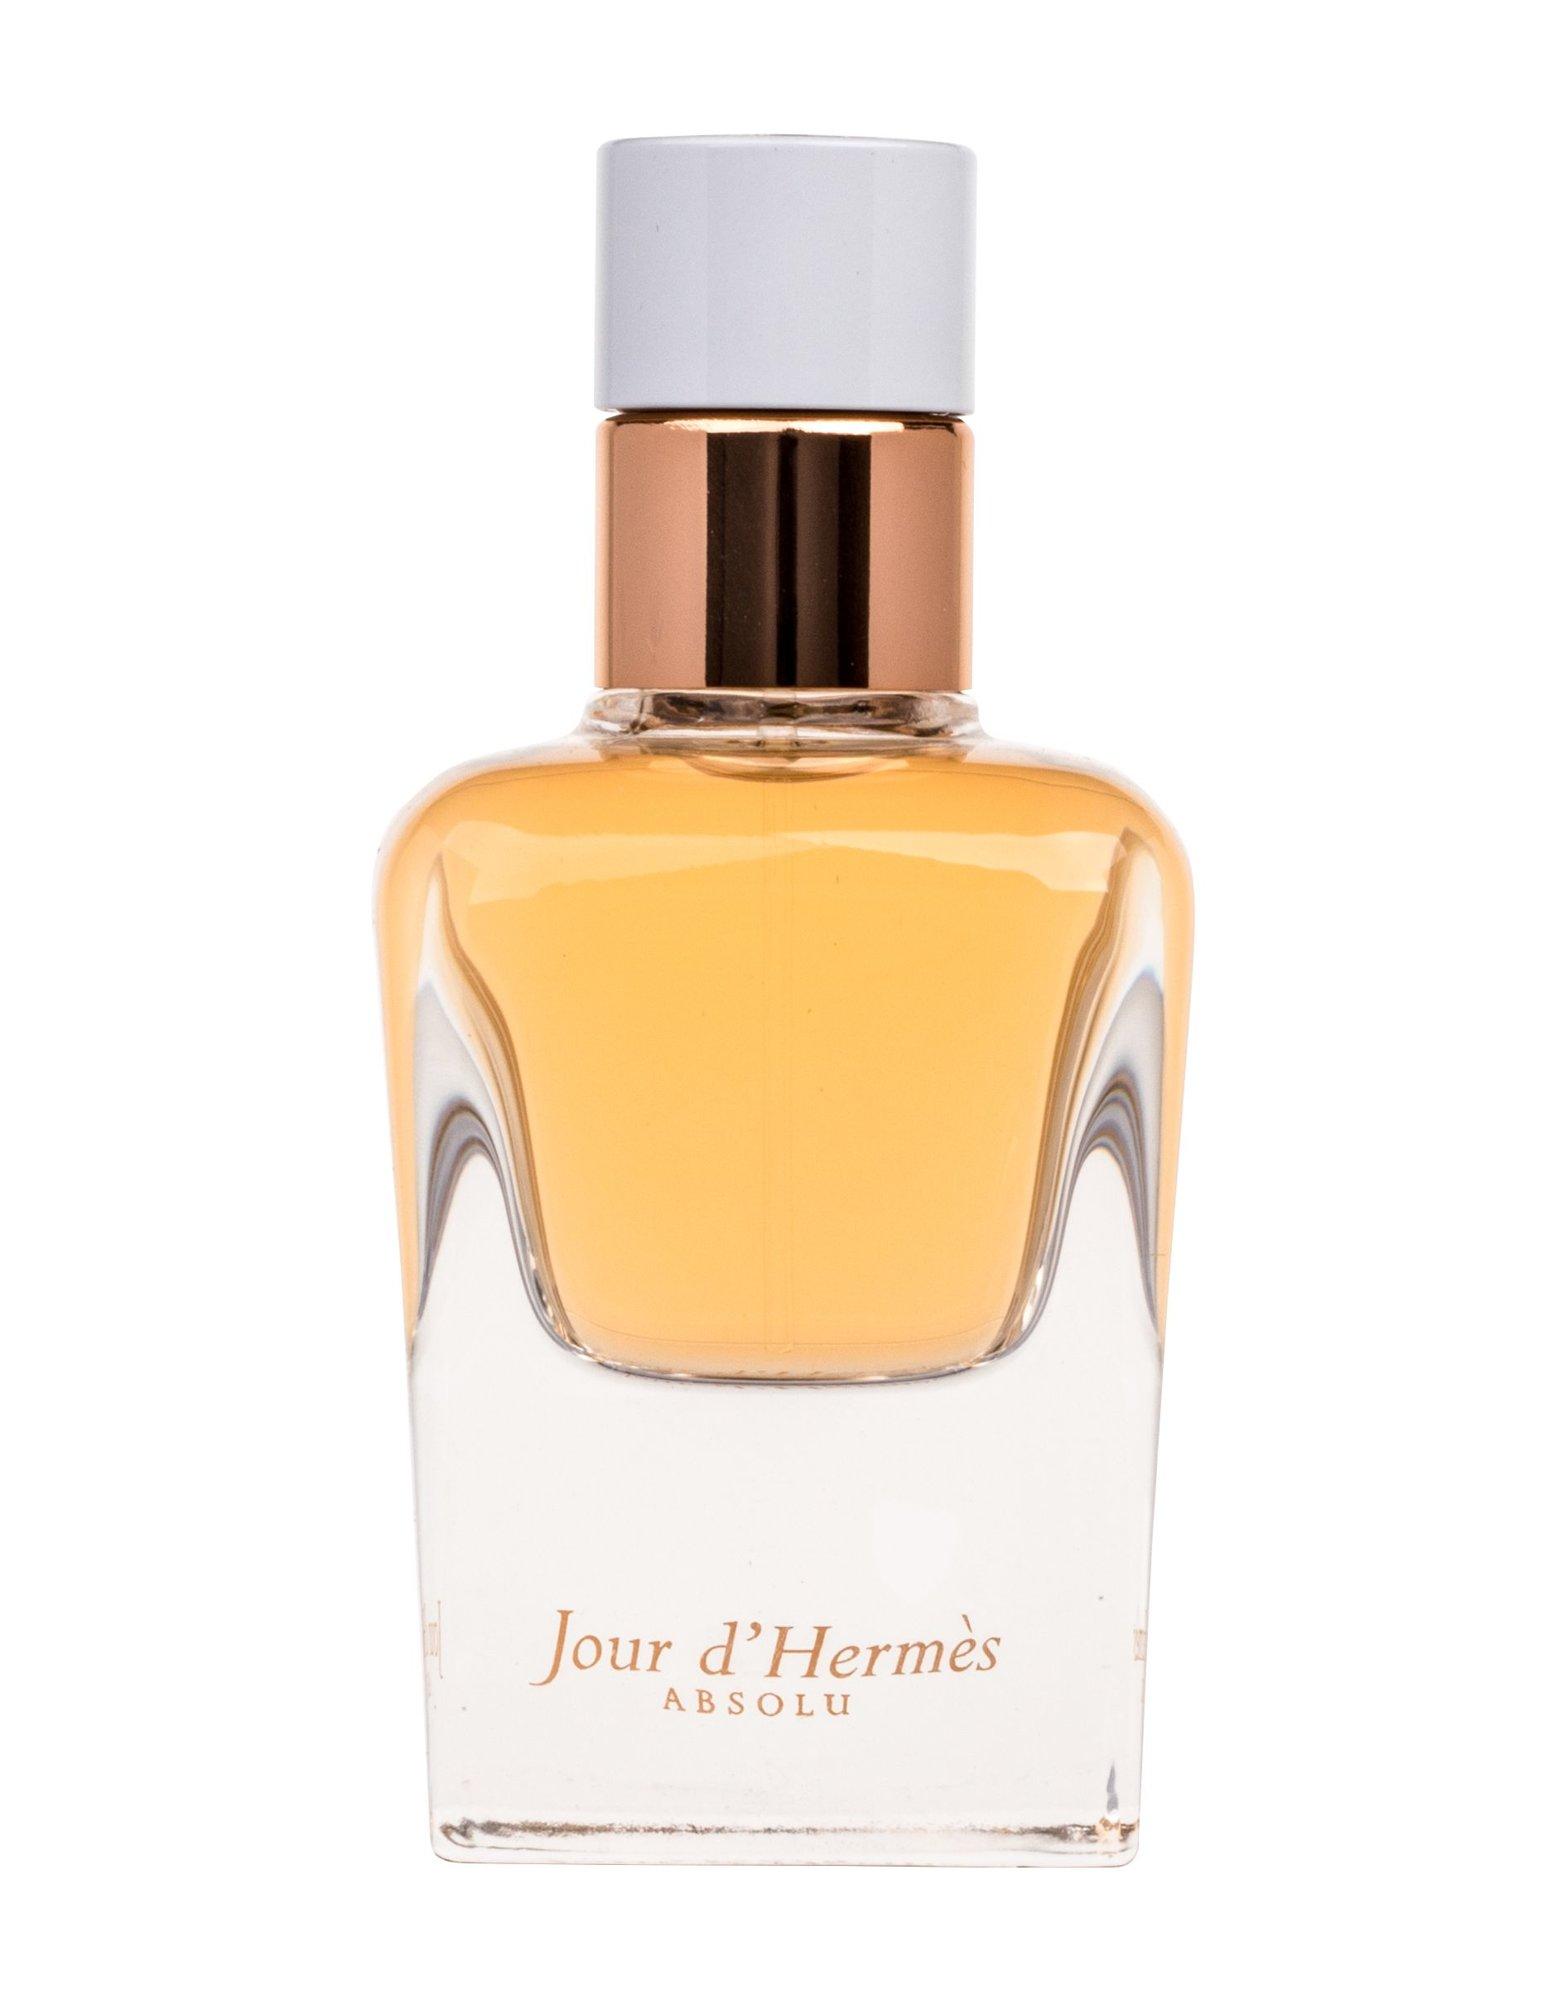 Hermes Jour d´Hermes Absolu EDP 30ml